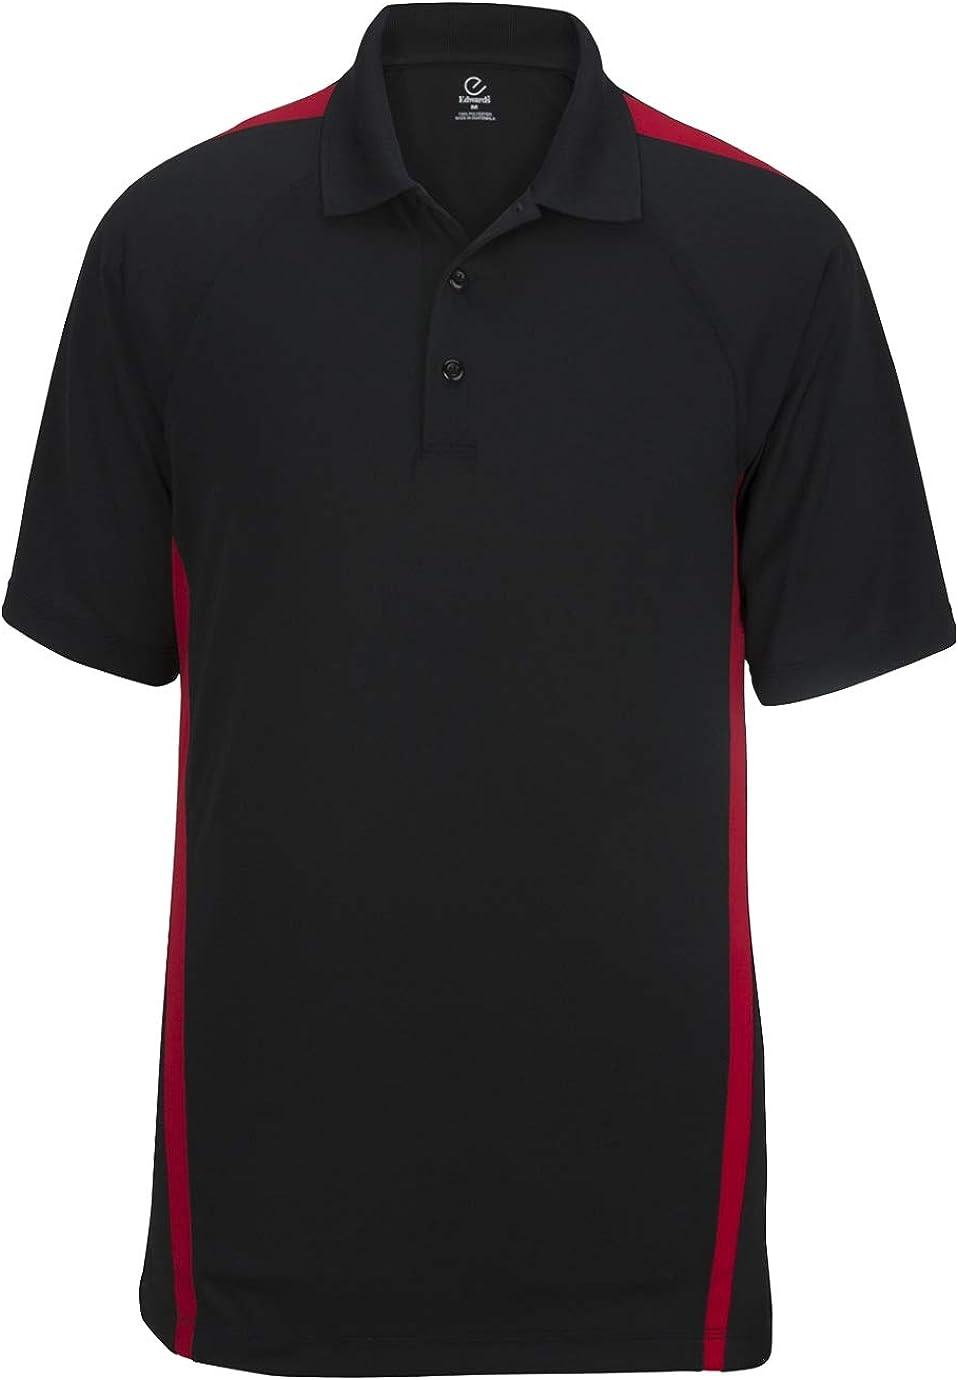 Edwards Men's Snag-Proof Color Block Short Sleeve Polo